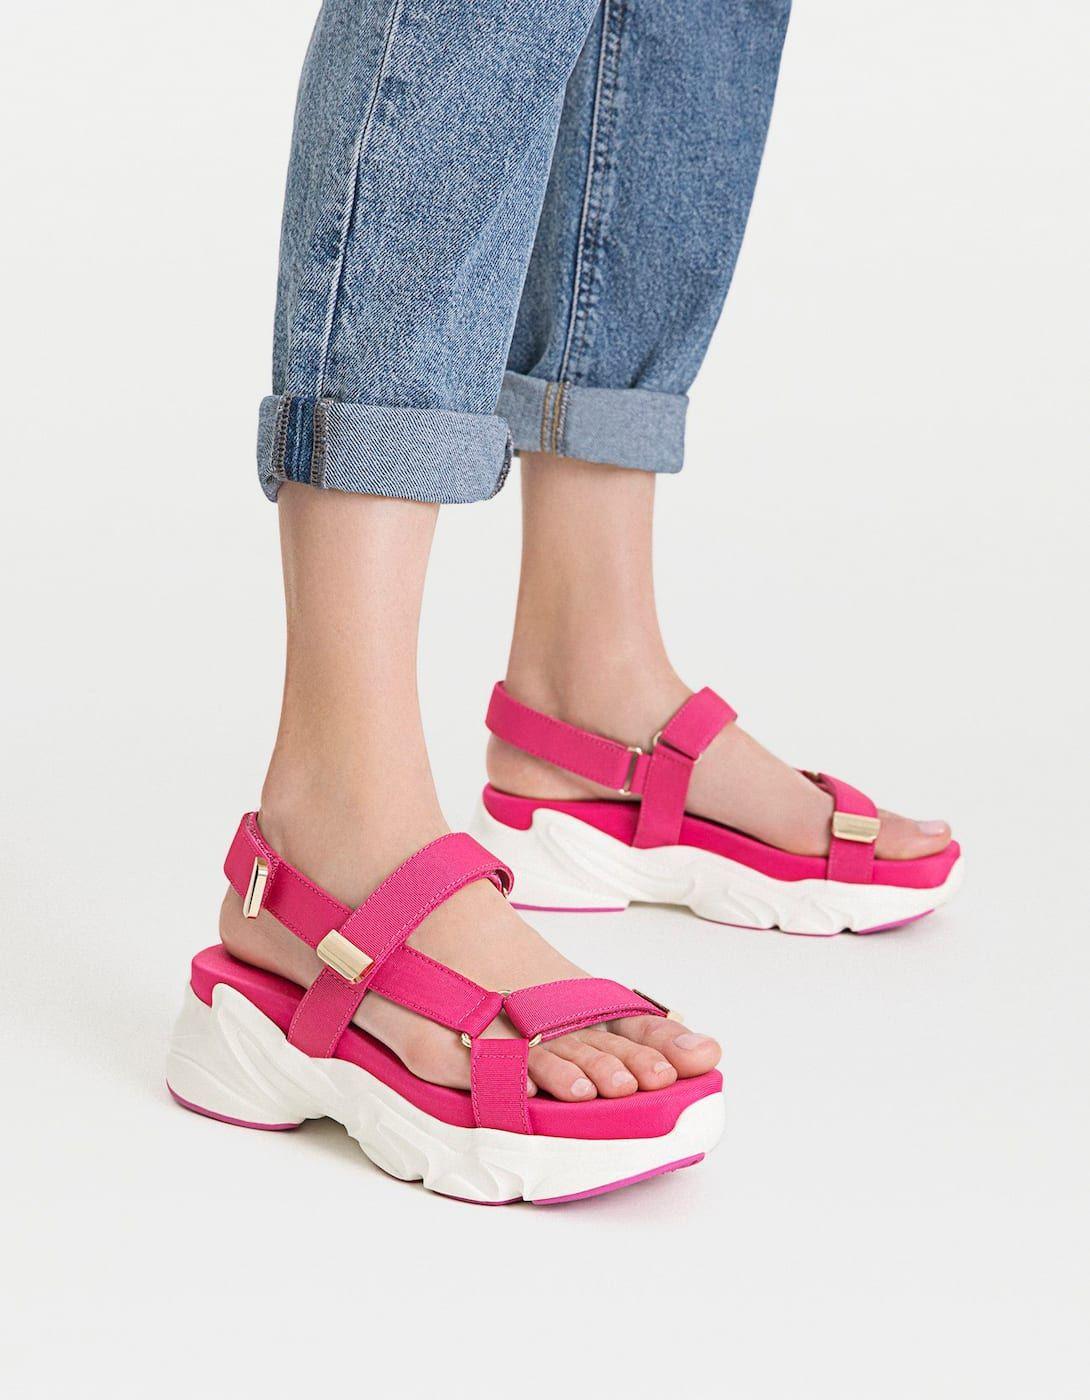 jugar joyería Infidelidad  Sandalias deportivas plataforma fucsia - Todos   Stradivarius Panamá    Zapatos mujer de moda, Sandalias bonitas, Zapatos mujer